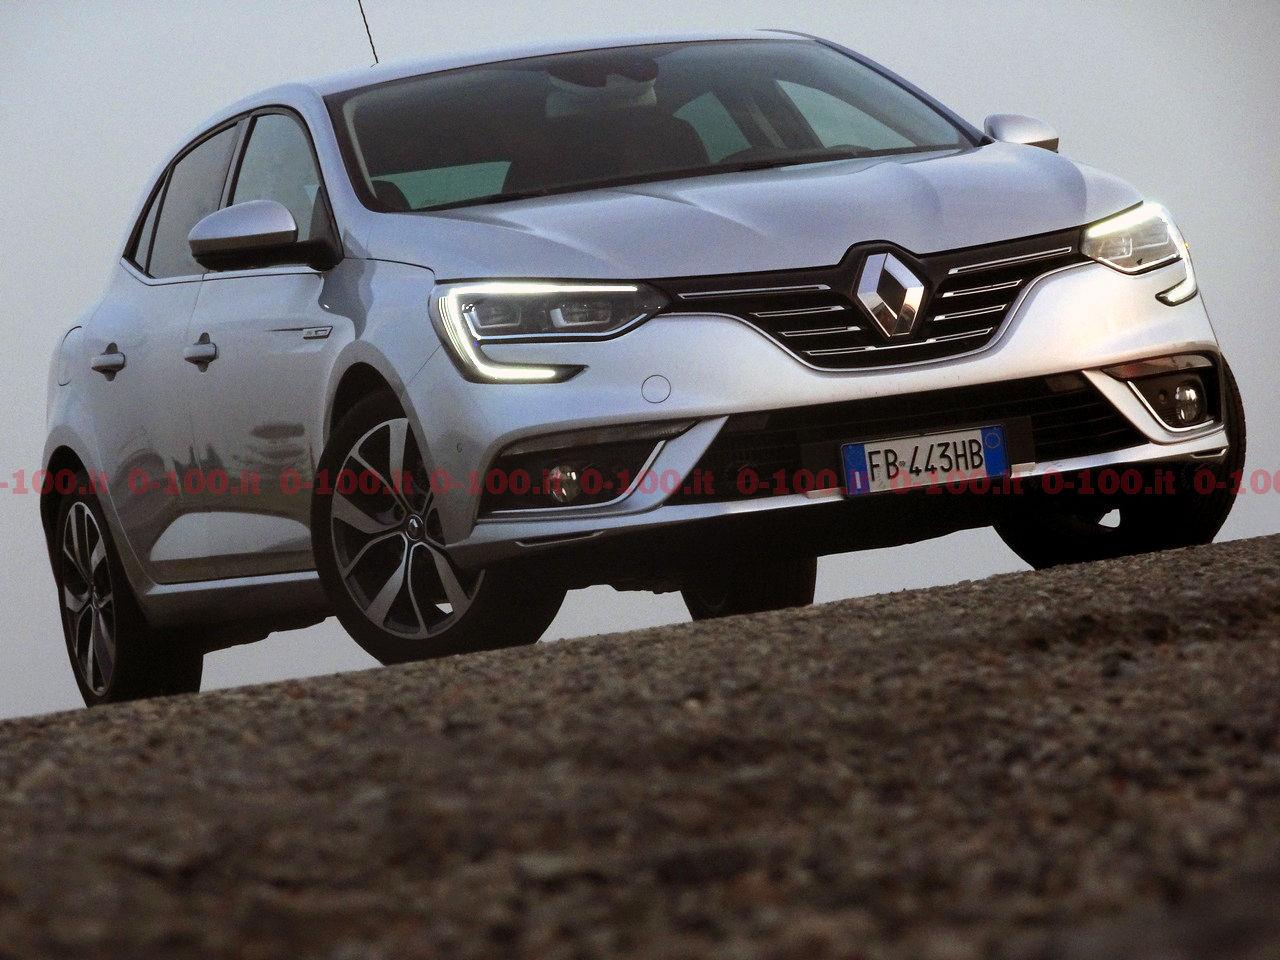 Renault-Megane-GT-Bose-dCi-130-test-prova-opinioni_0-100_1